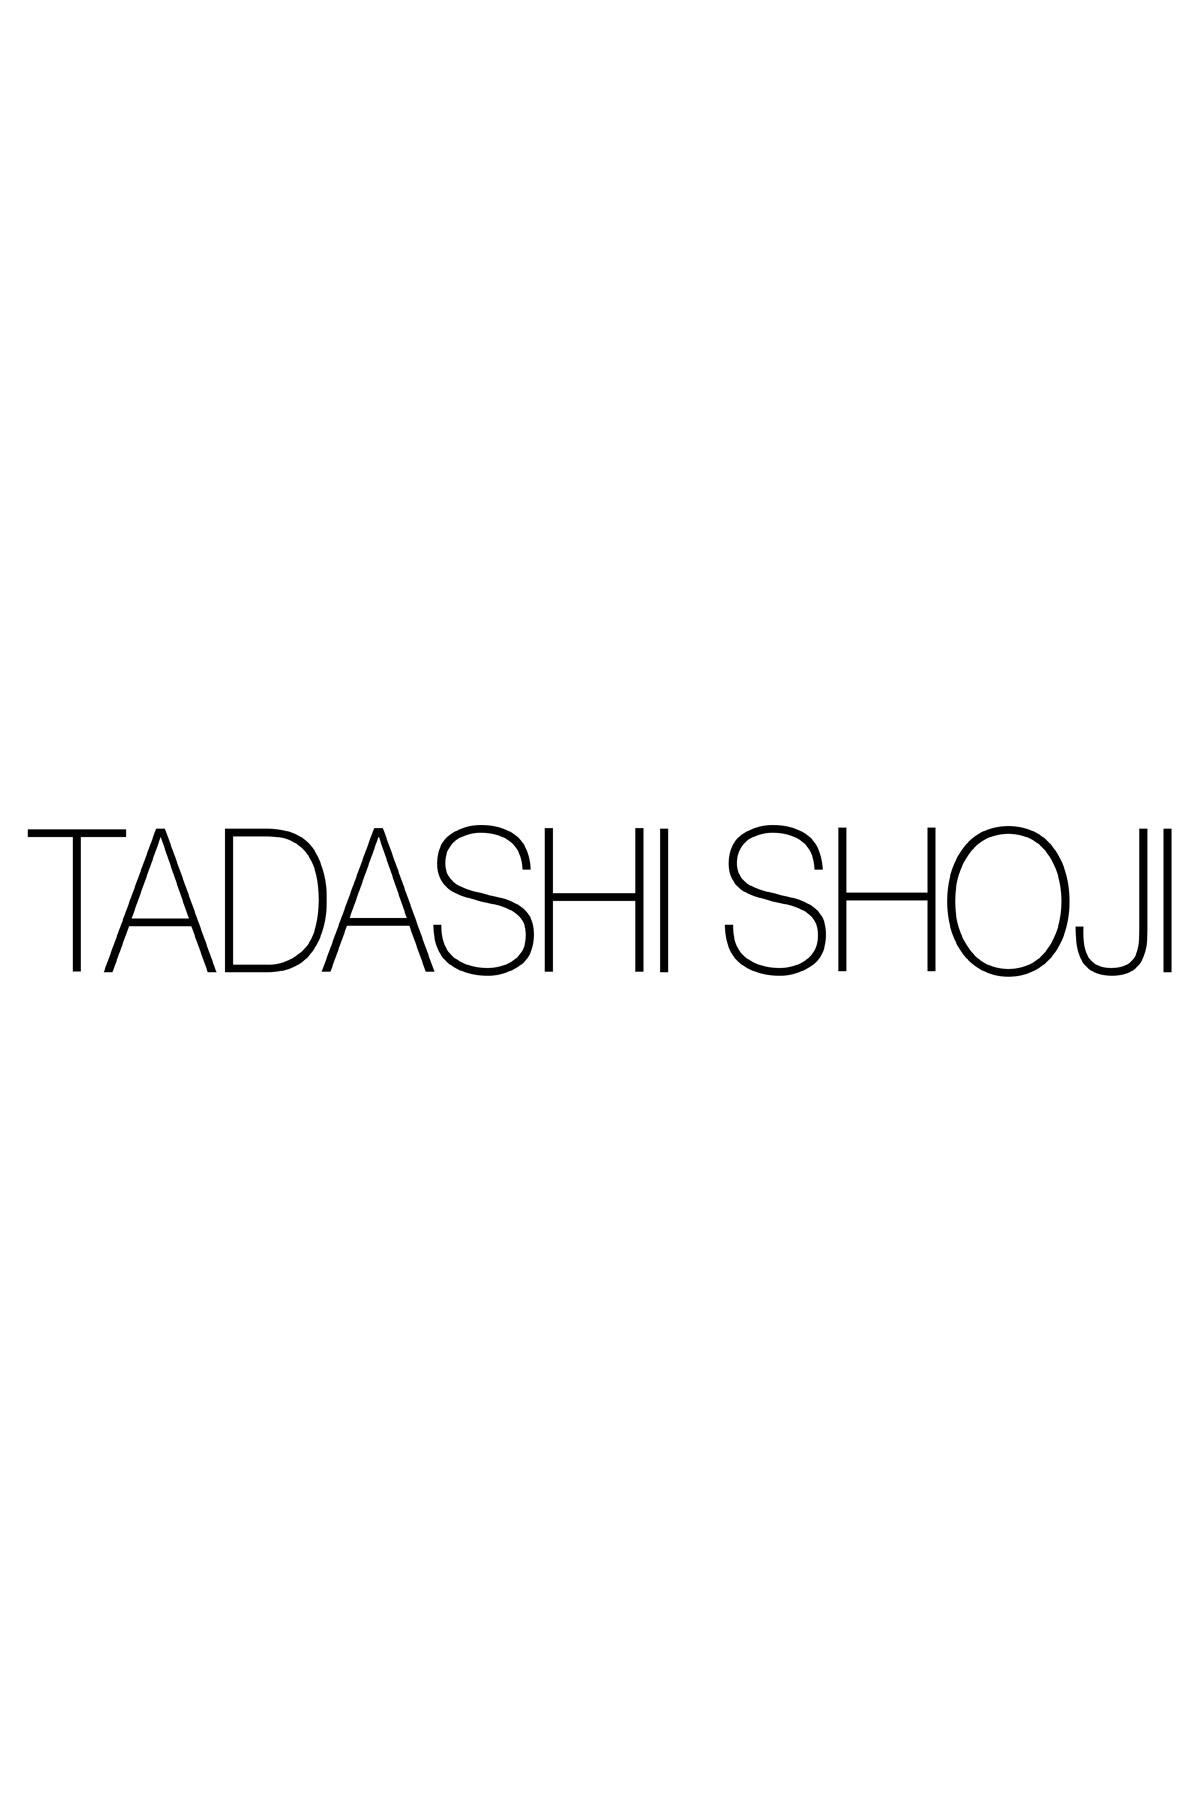 Tadashi Shoji - Brielle Headband